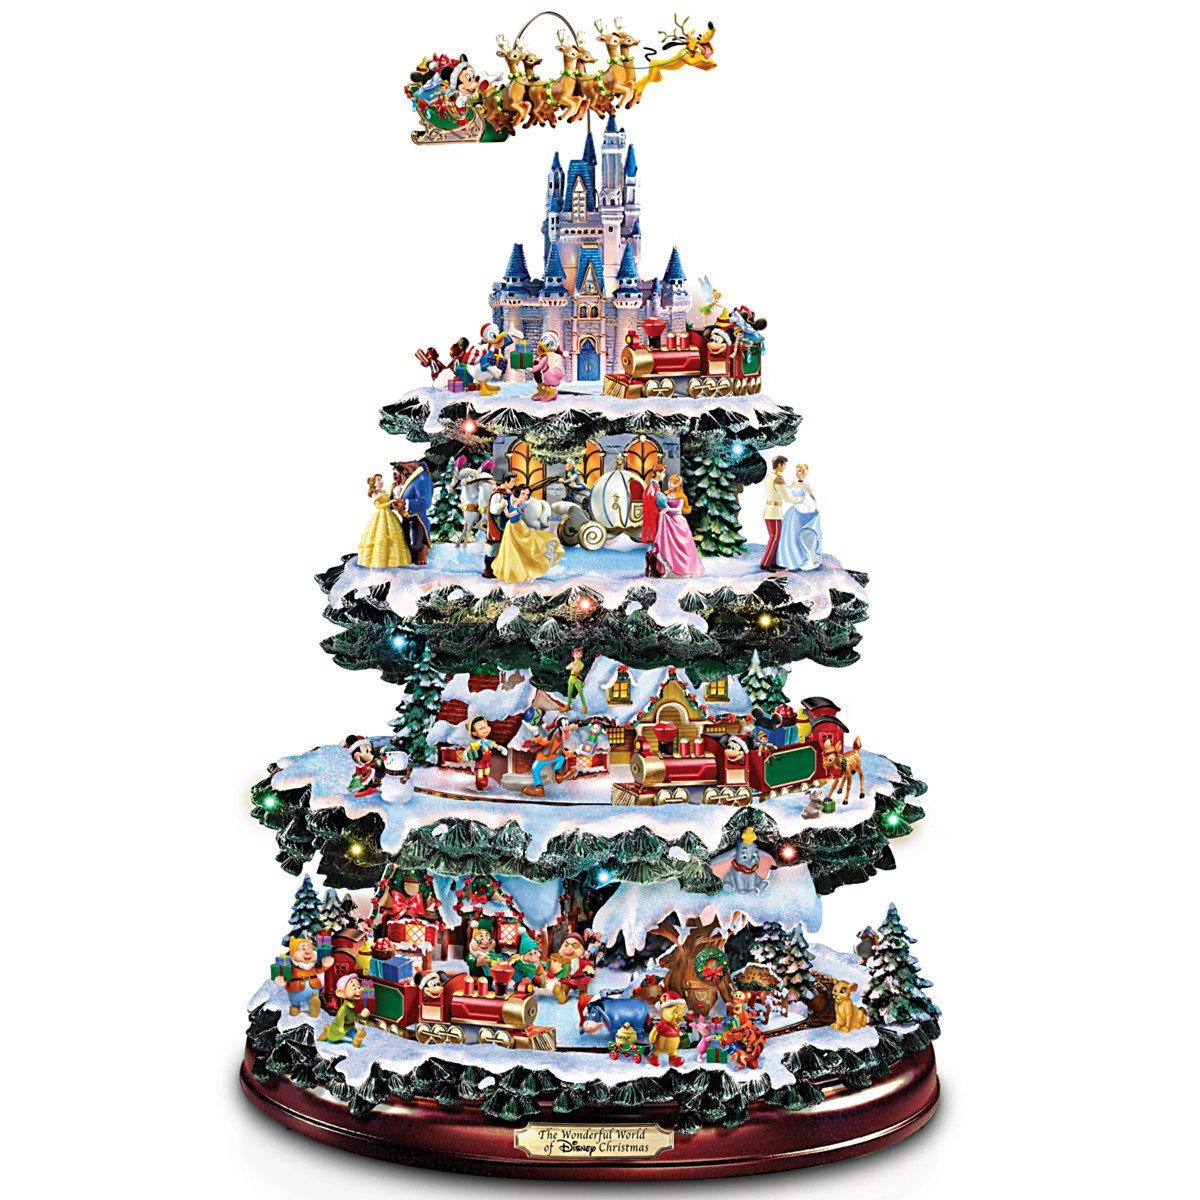 Disney Tabletop Christmas Tree: The Wonderful World Of Disney by The Bradford Exchange